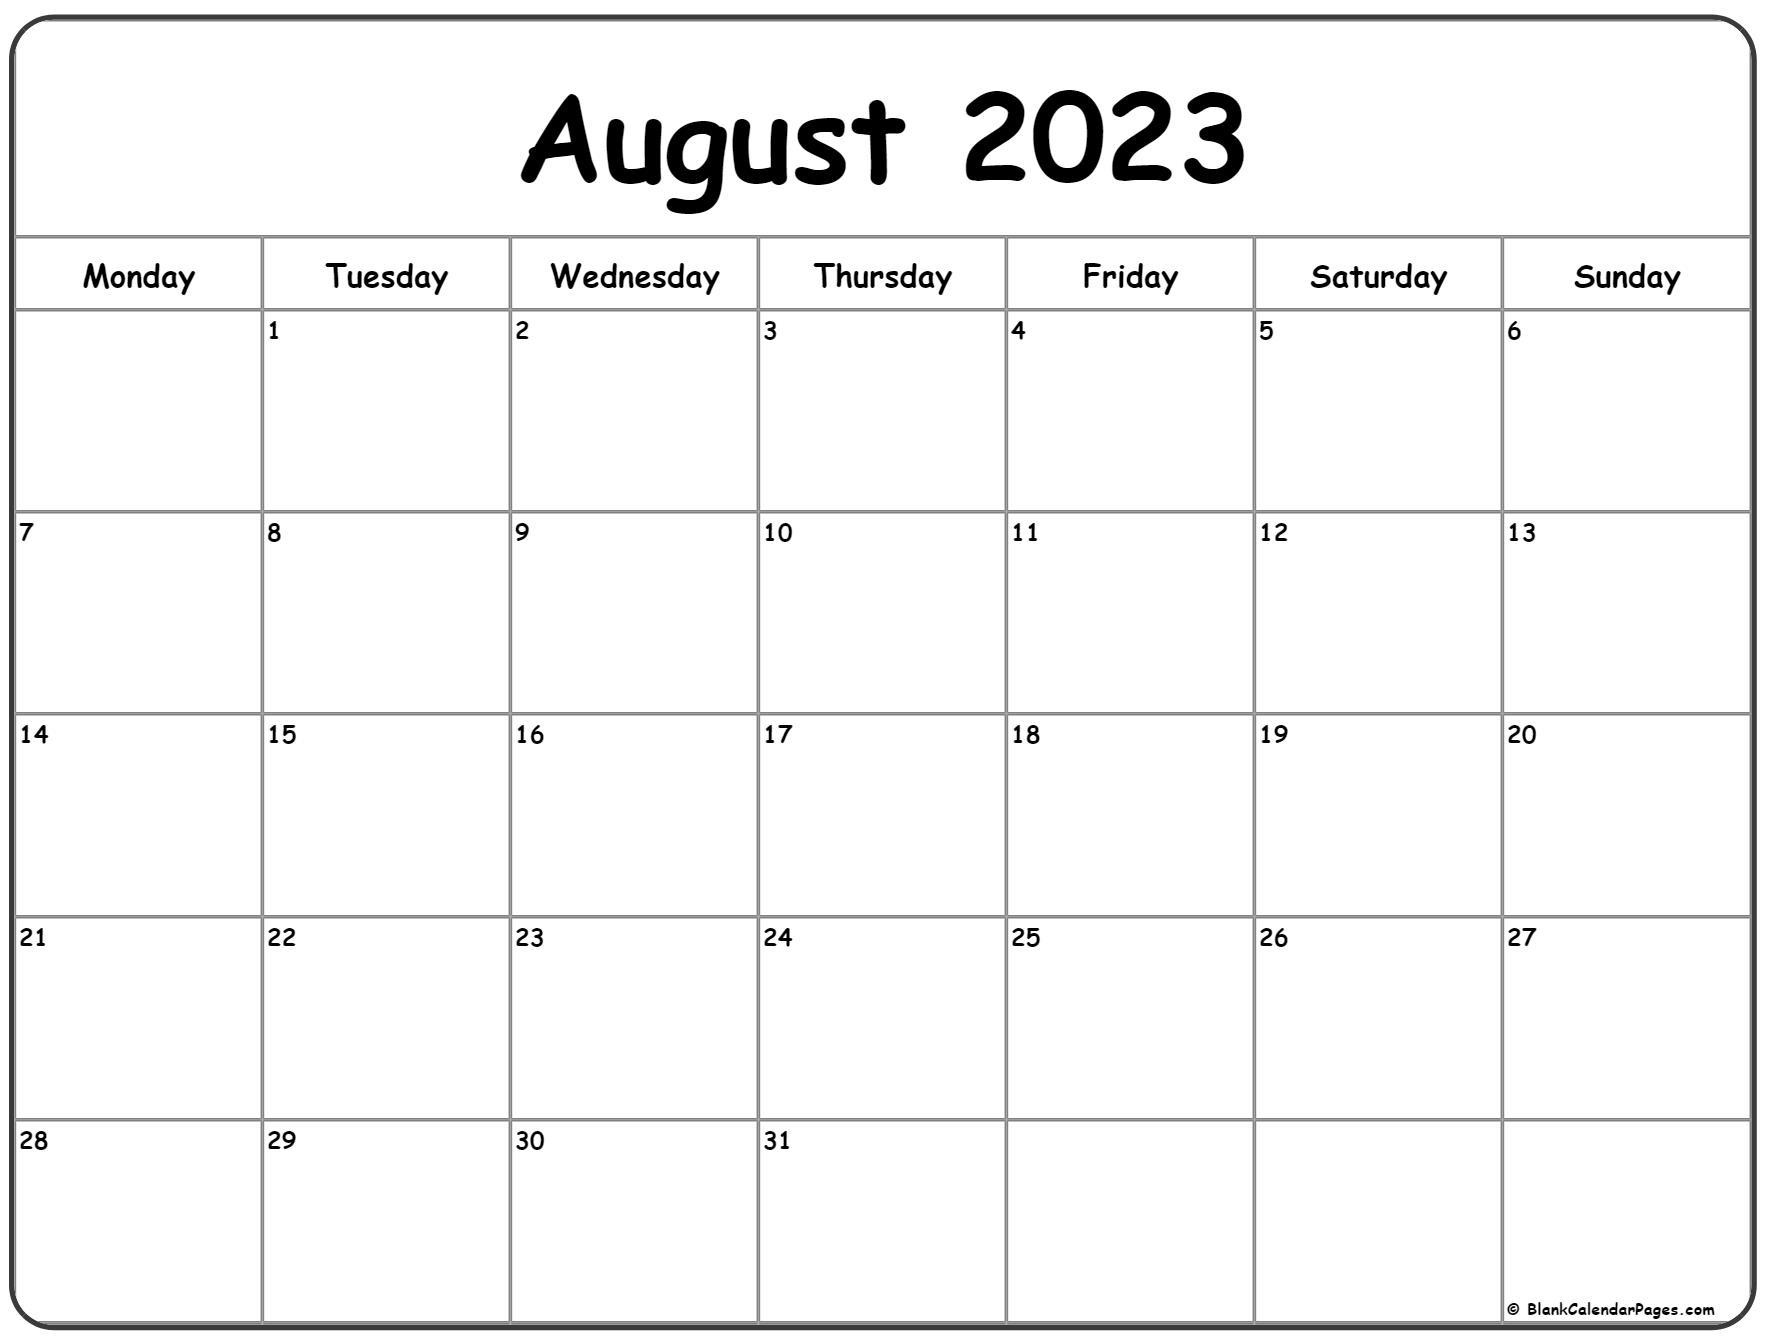 August 2023 Monday calendar. Monday to Sunday